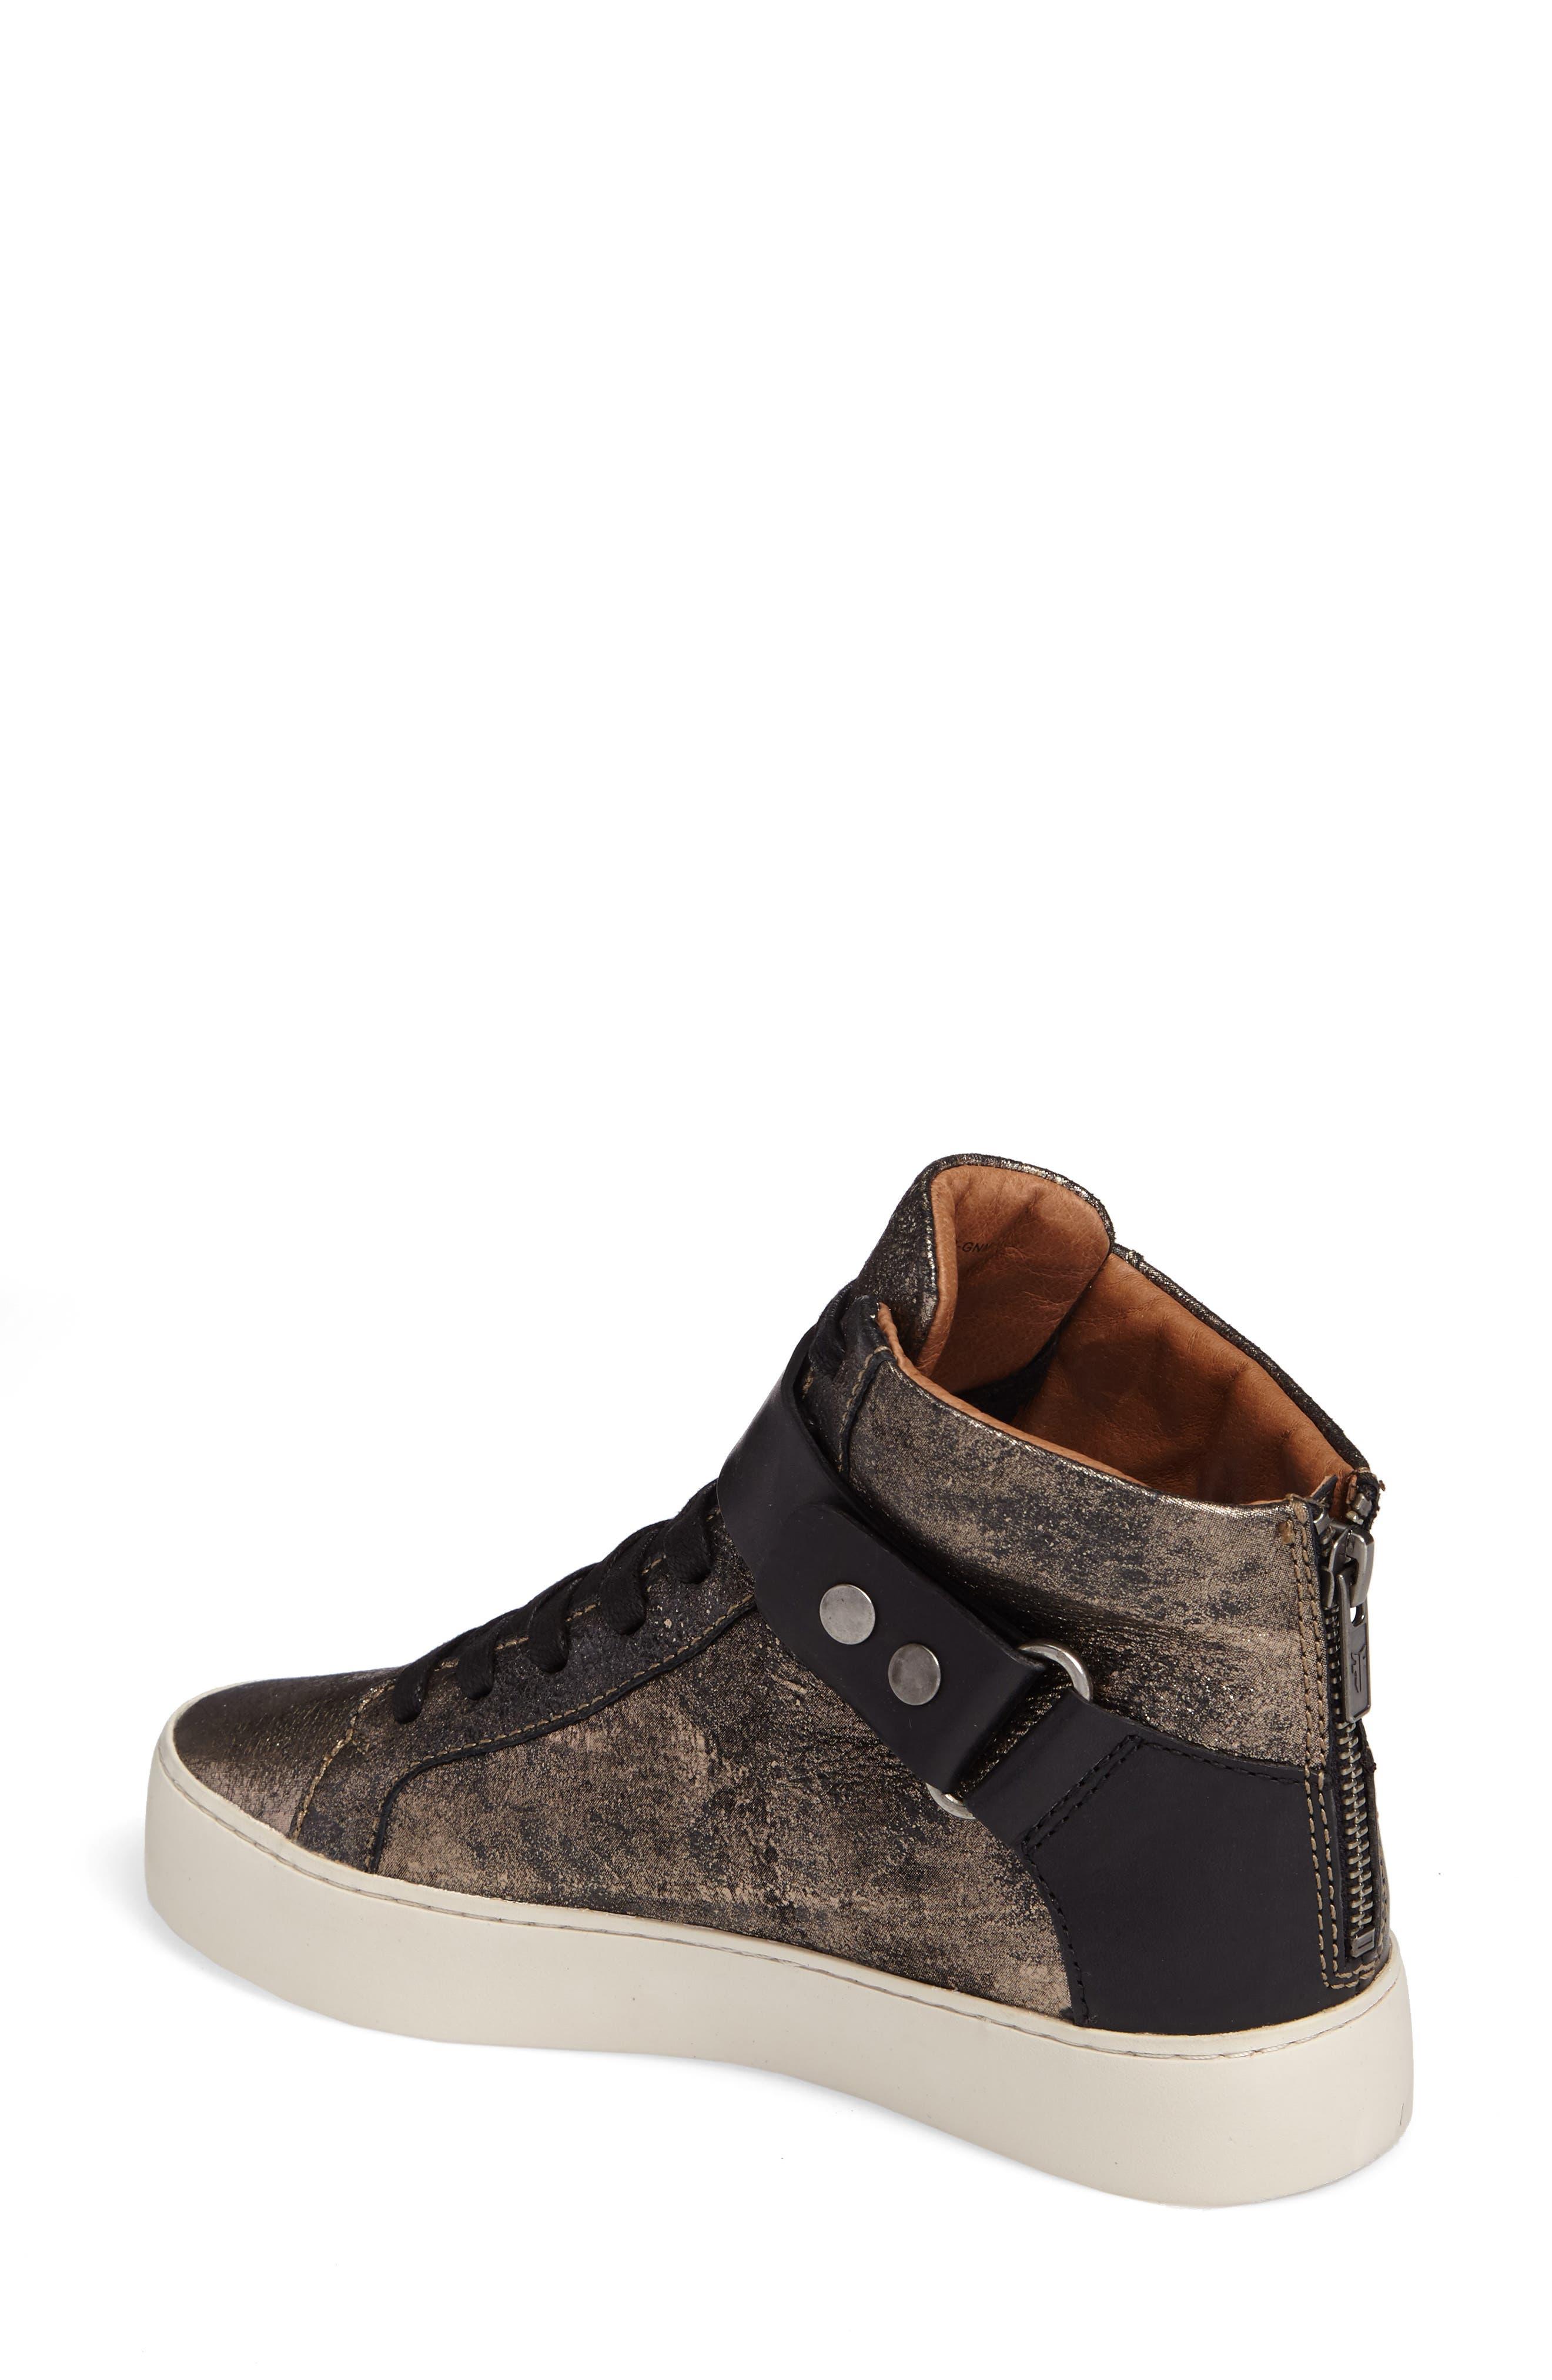 Lena Harness High Top Sneaker,                             Alternate thumbnail 2, color,                             Gunmetal